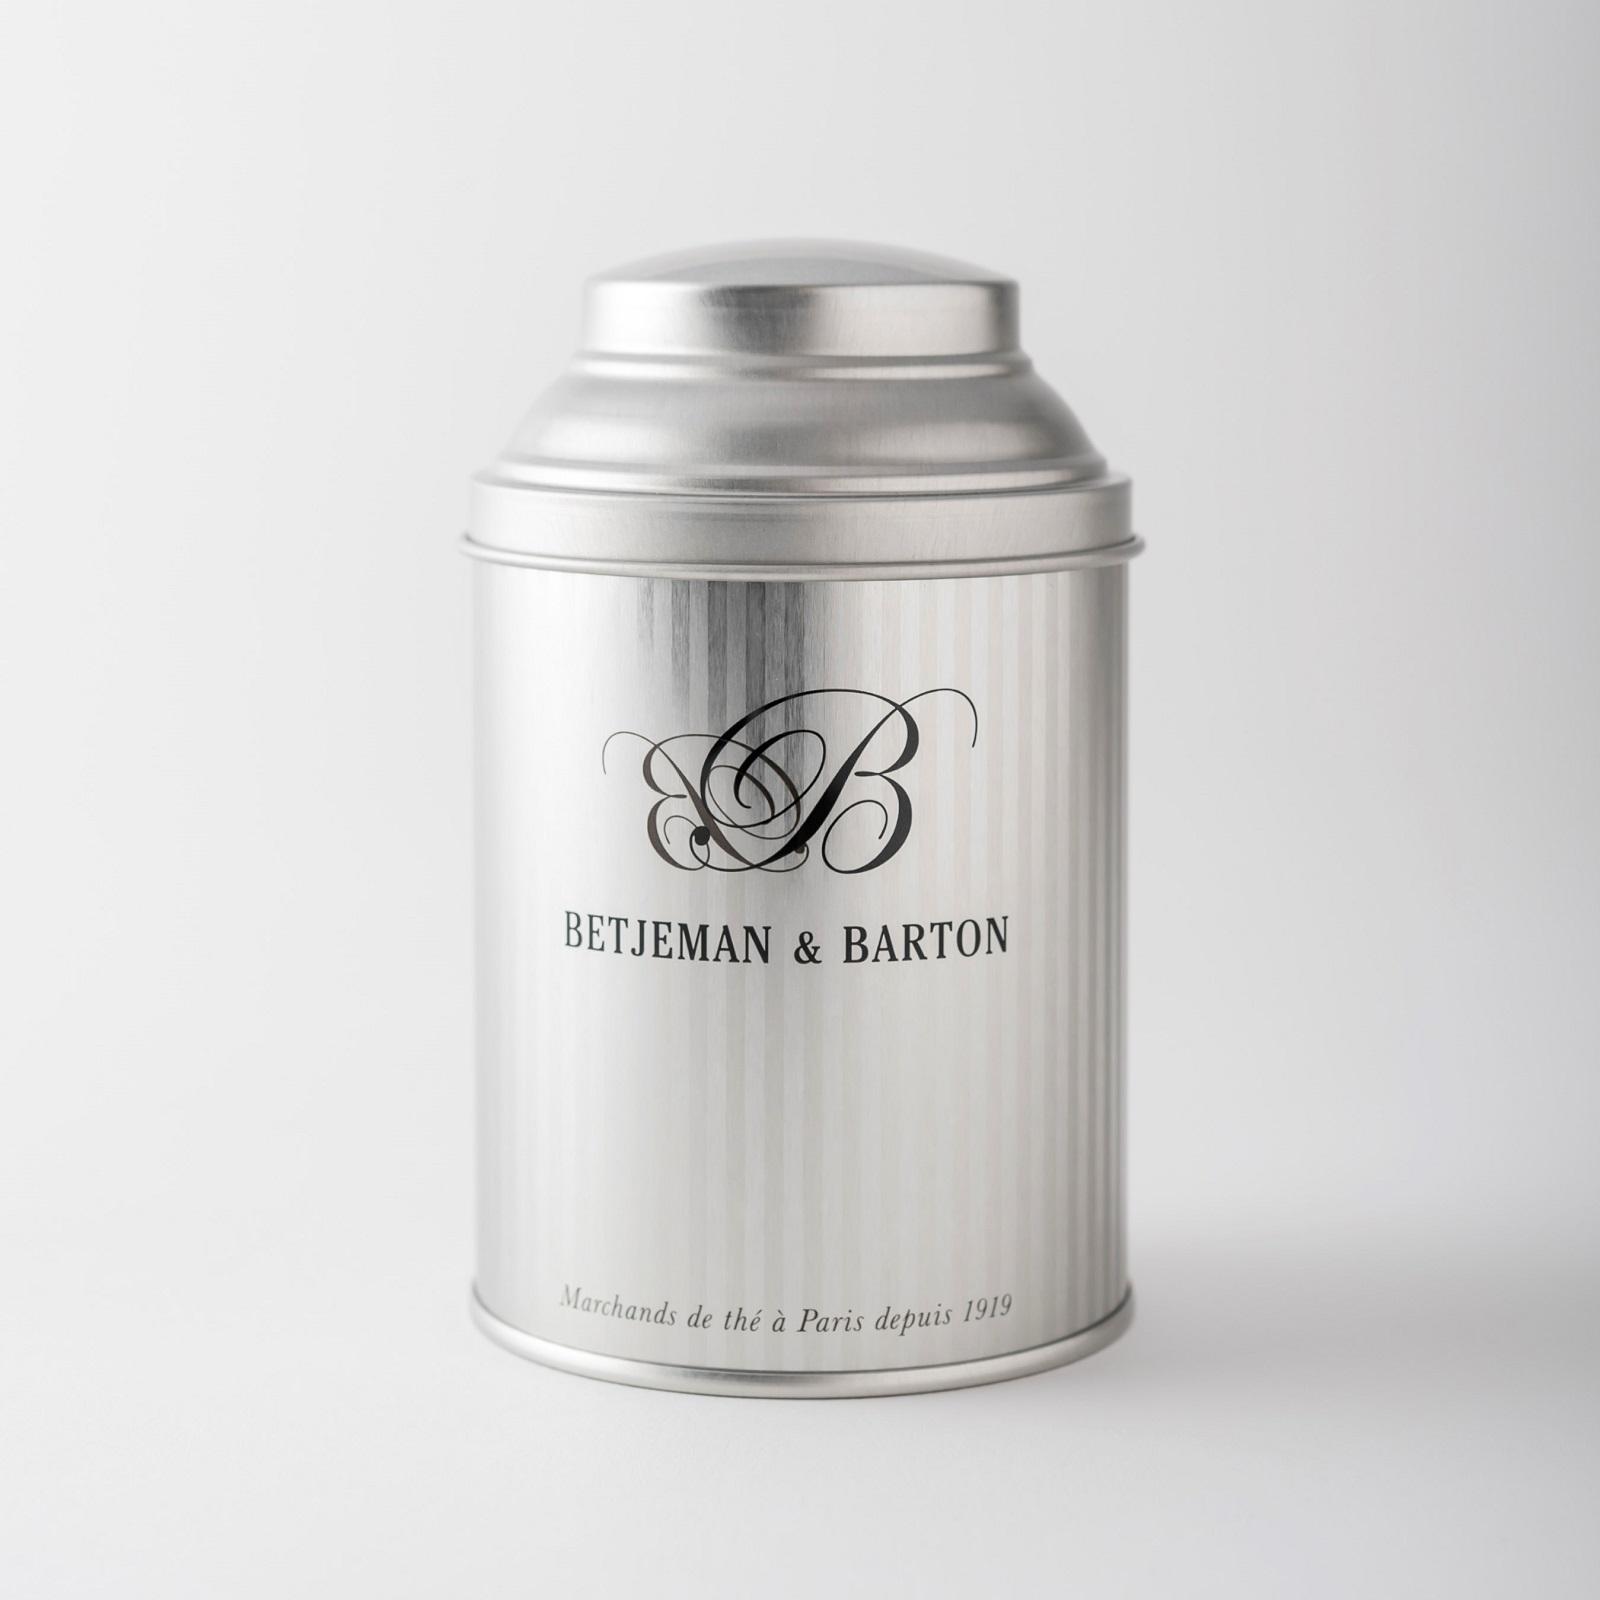 Malesherbes マルゼルブ 70g缶